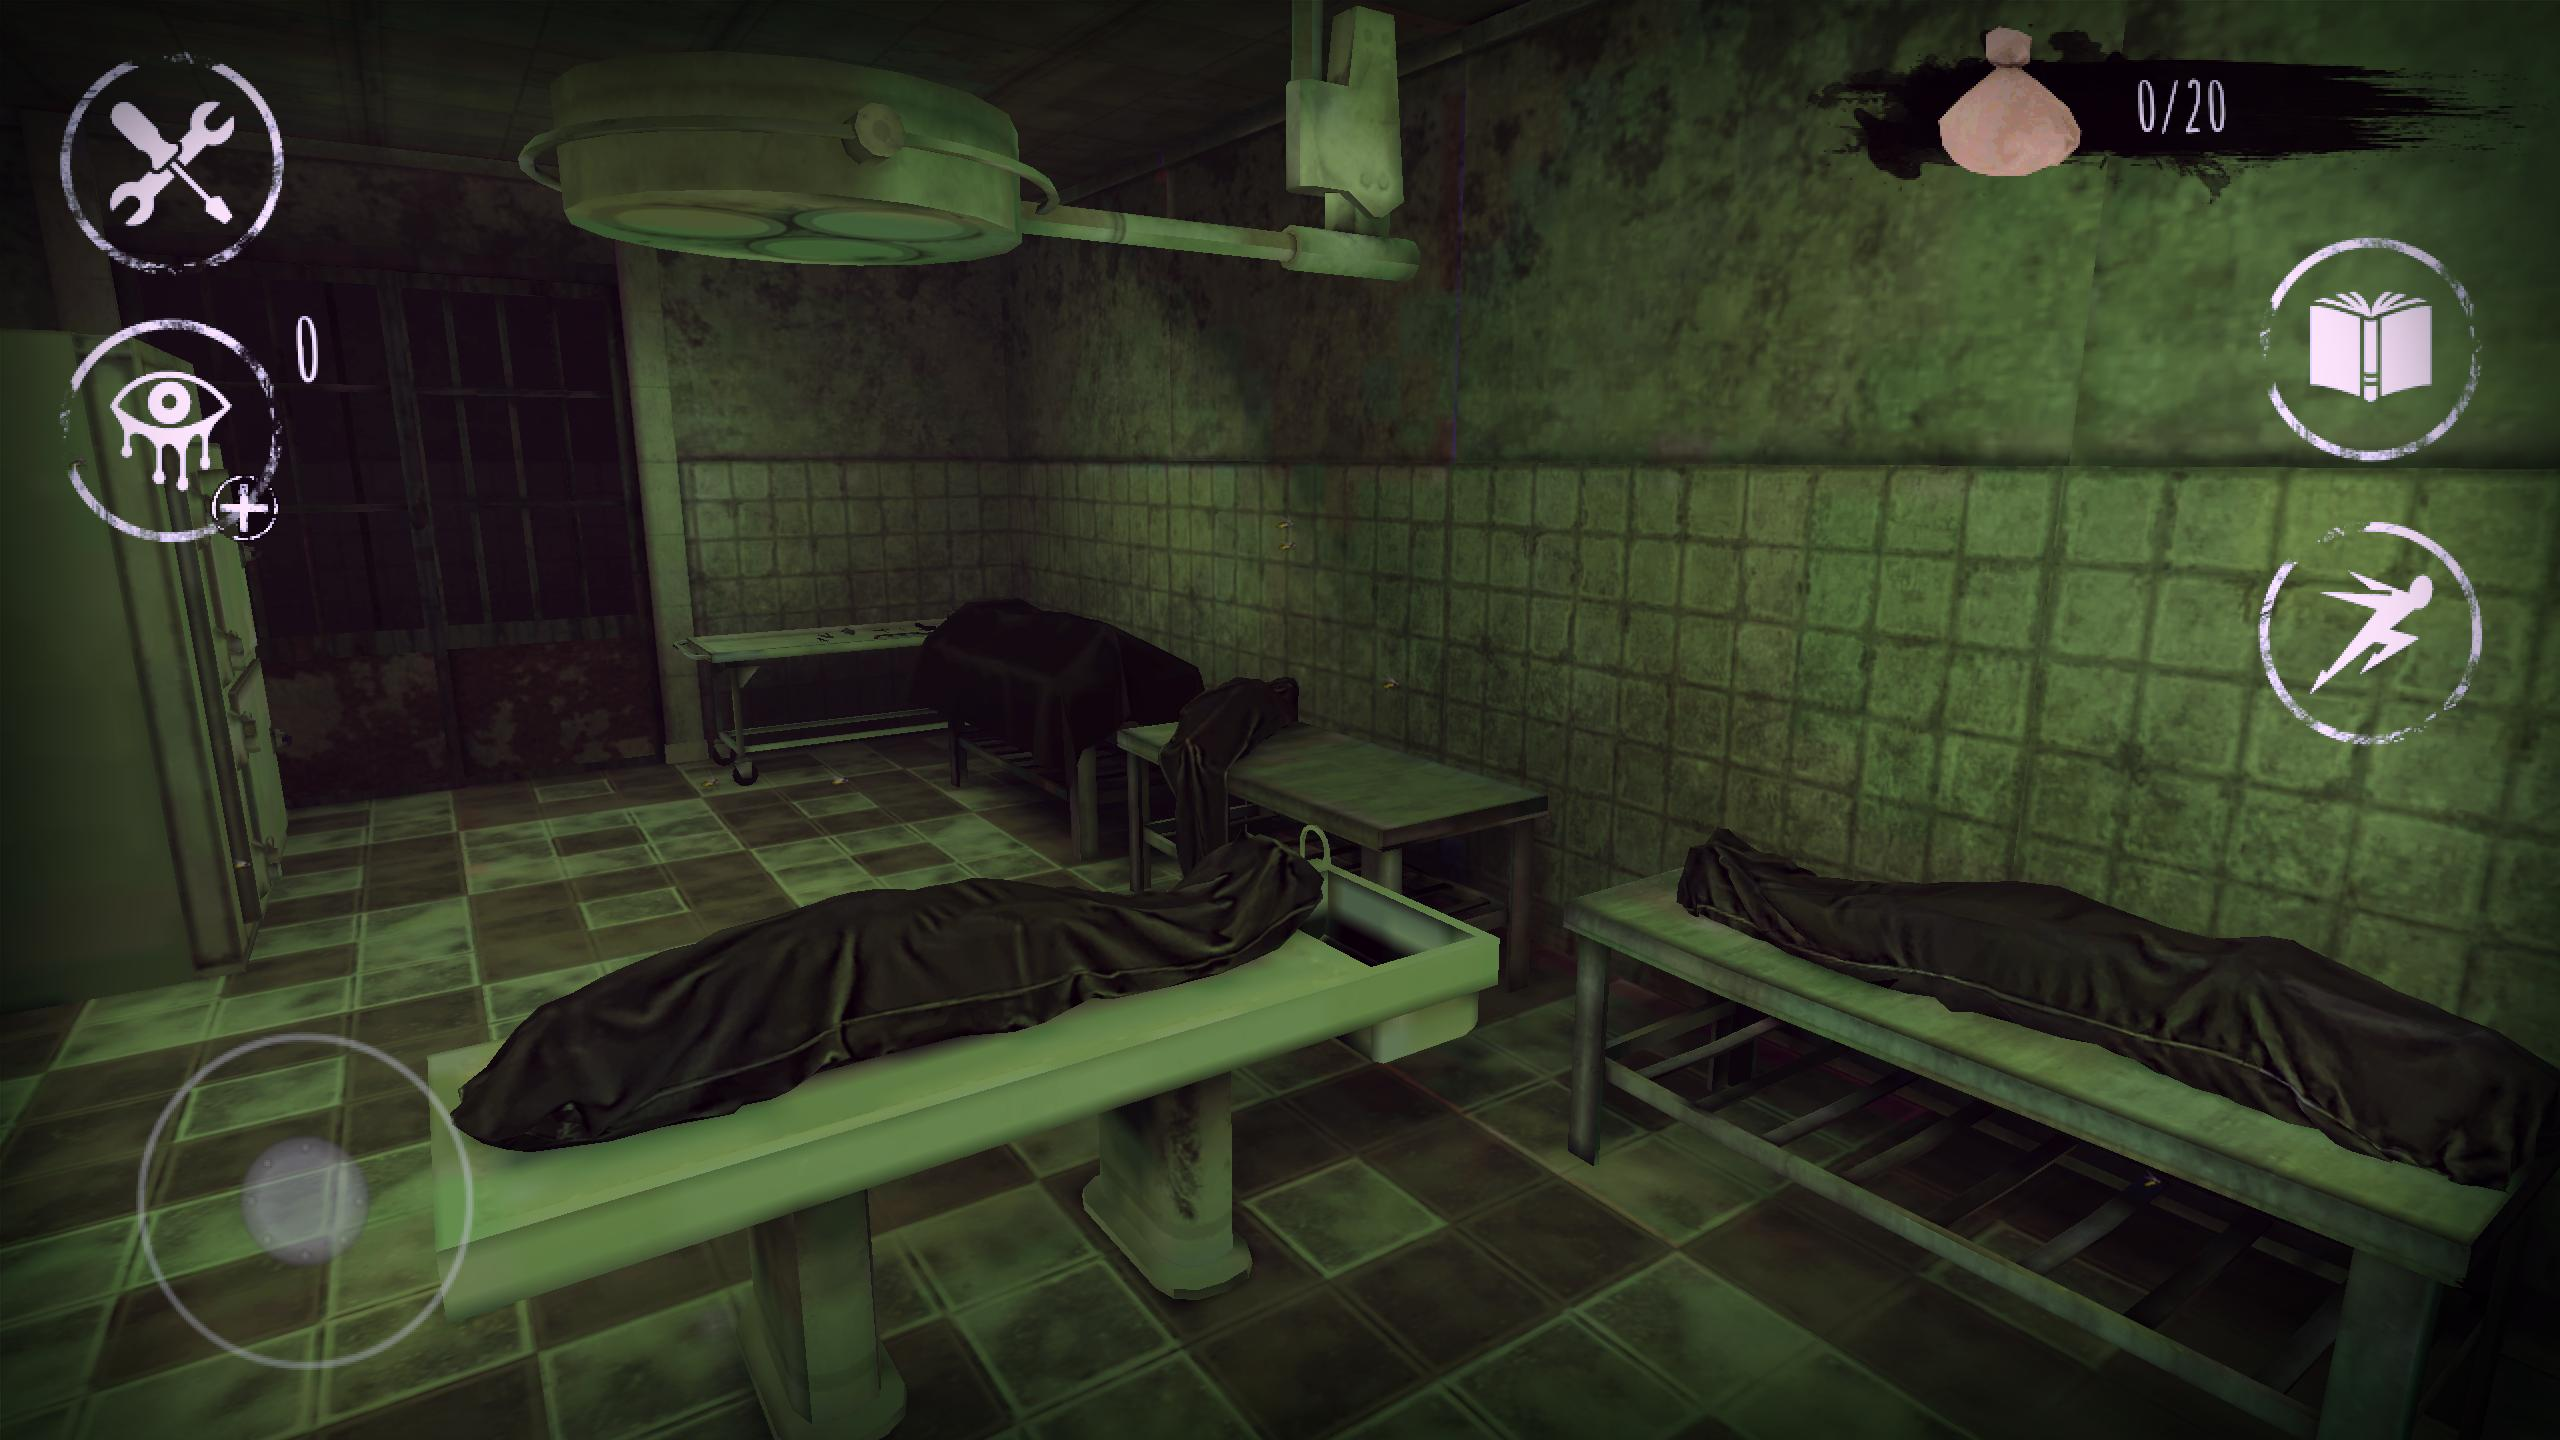 Eyes: Scary Thriller - Creepy Horror Game 6.1.1 Screenshot 2